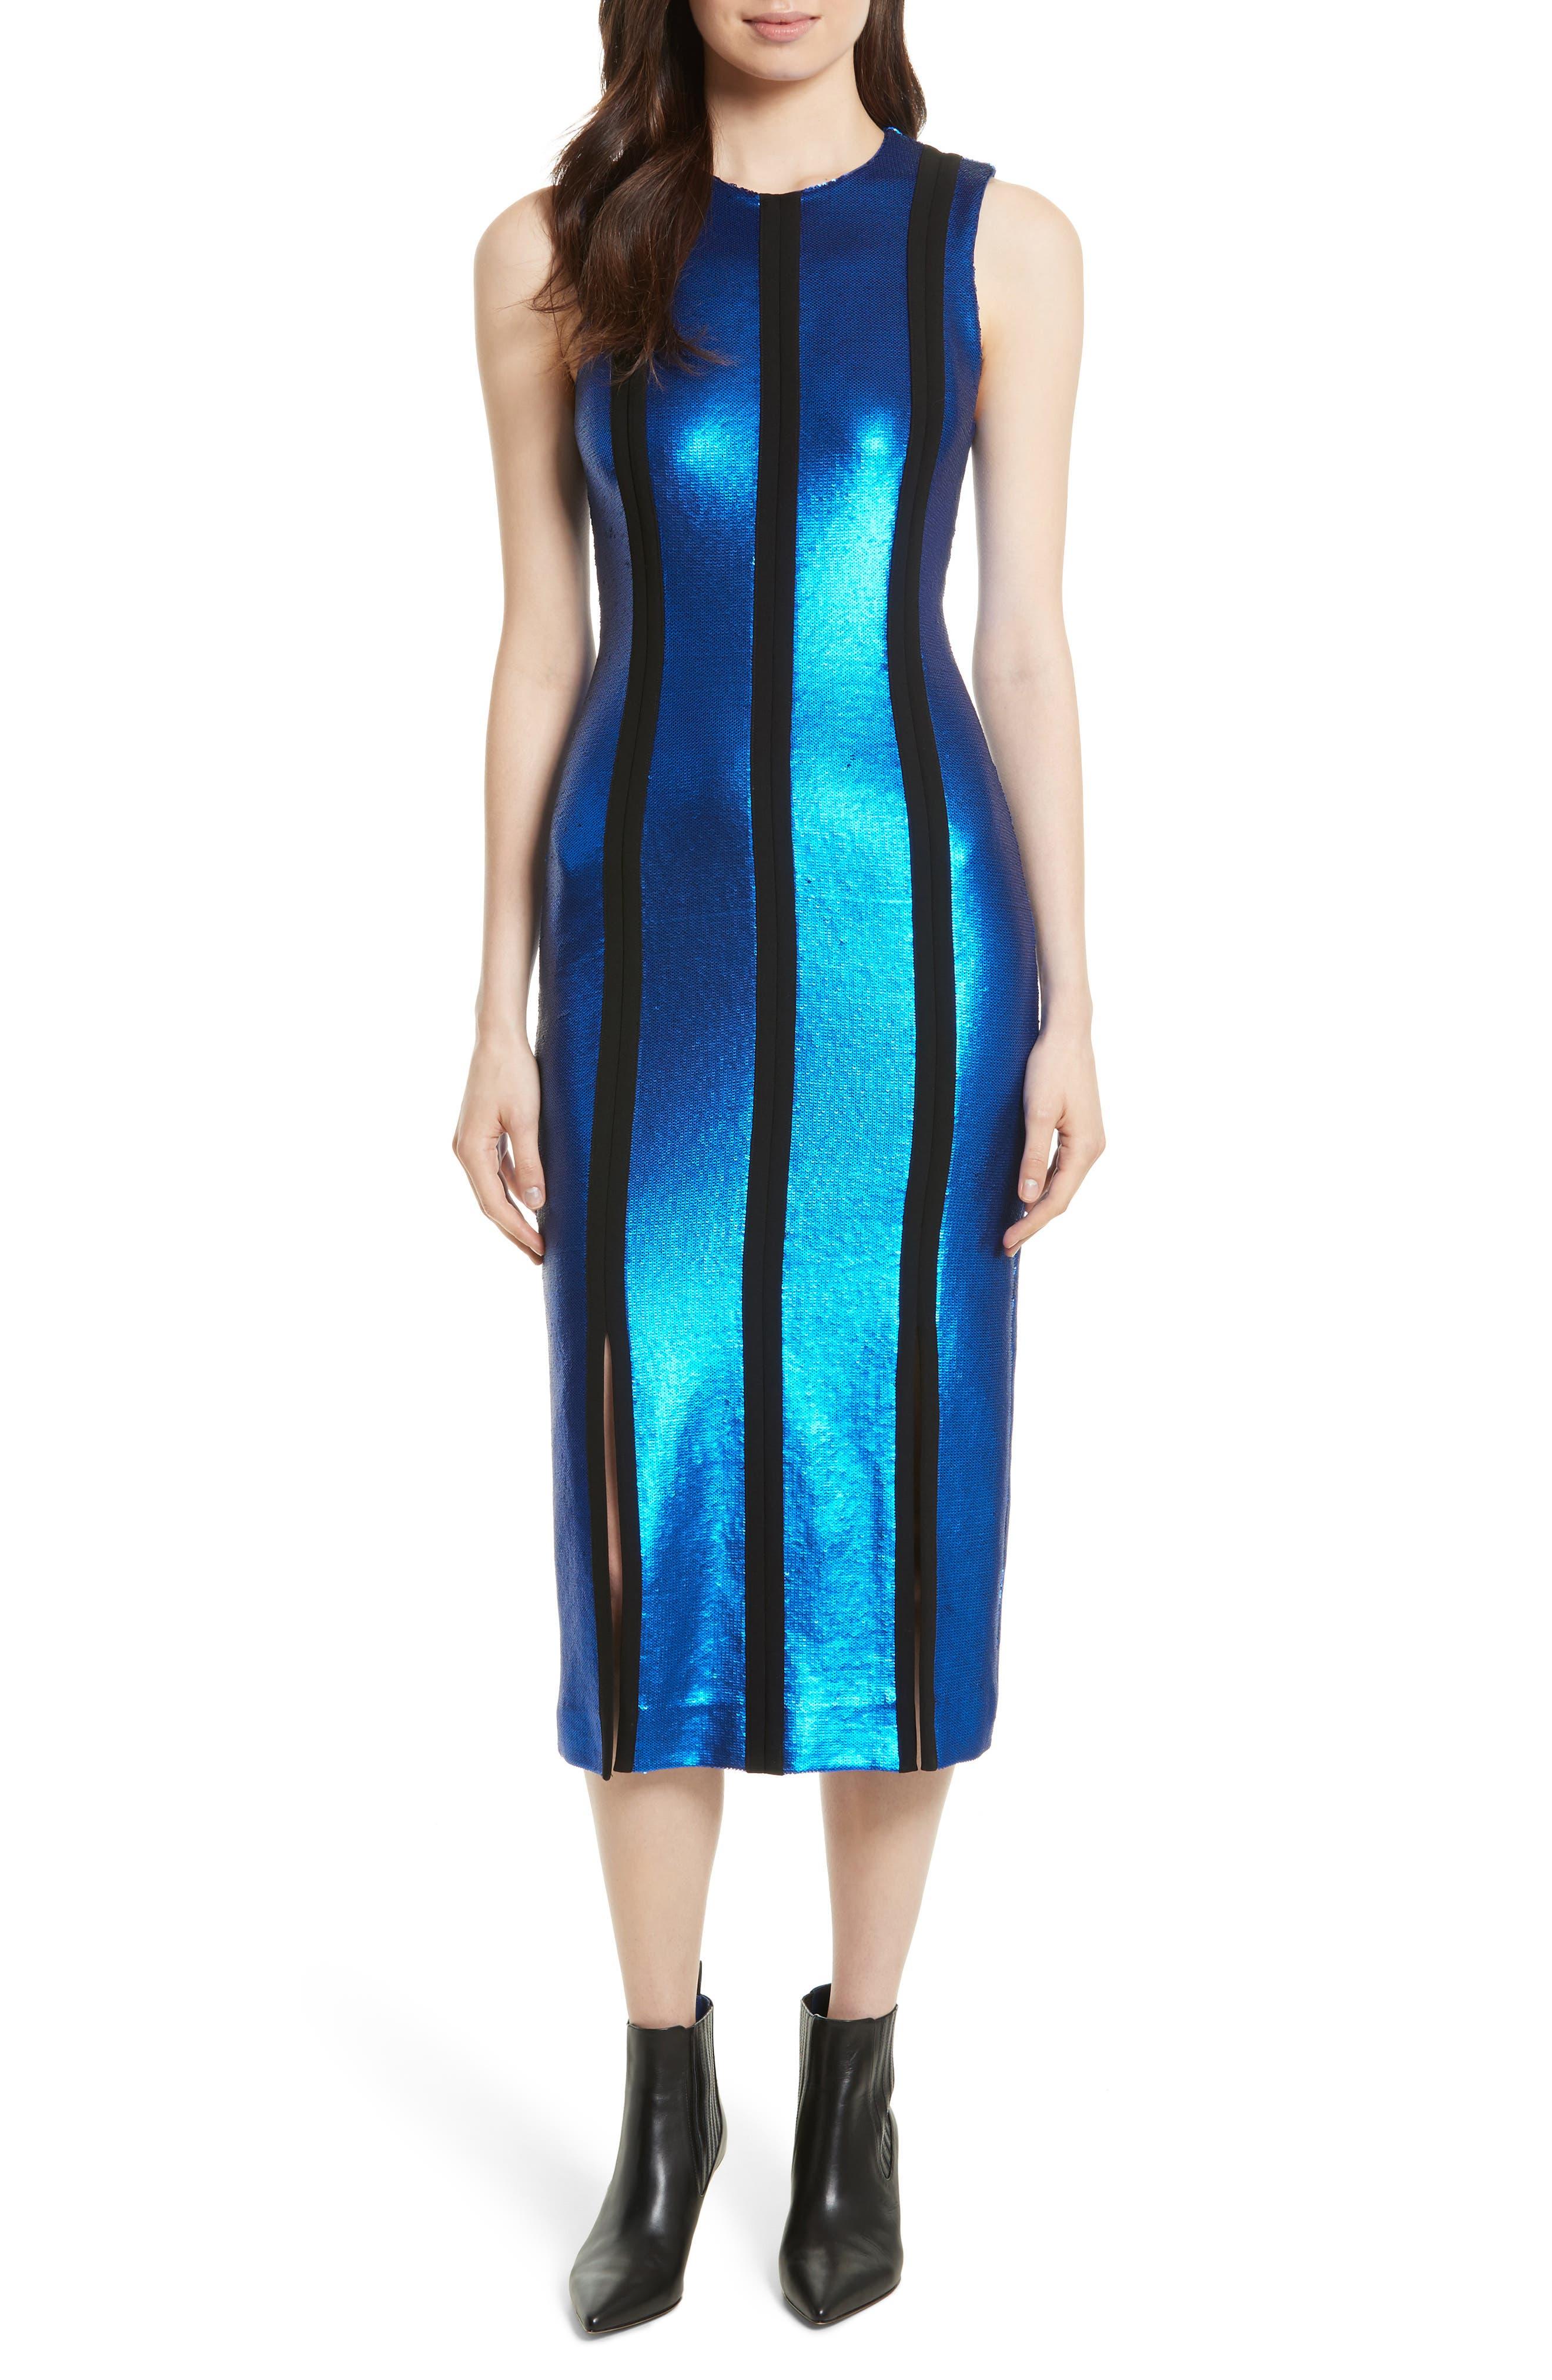 Alternate Image 1 Selected - Diane von Furstenberg Sequin Panel Midi Dress